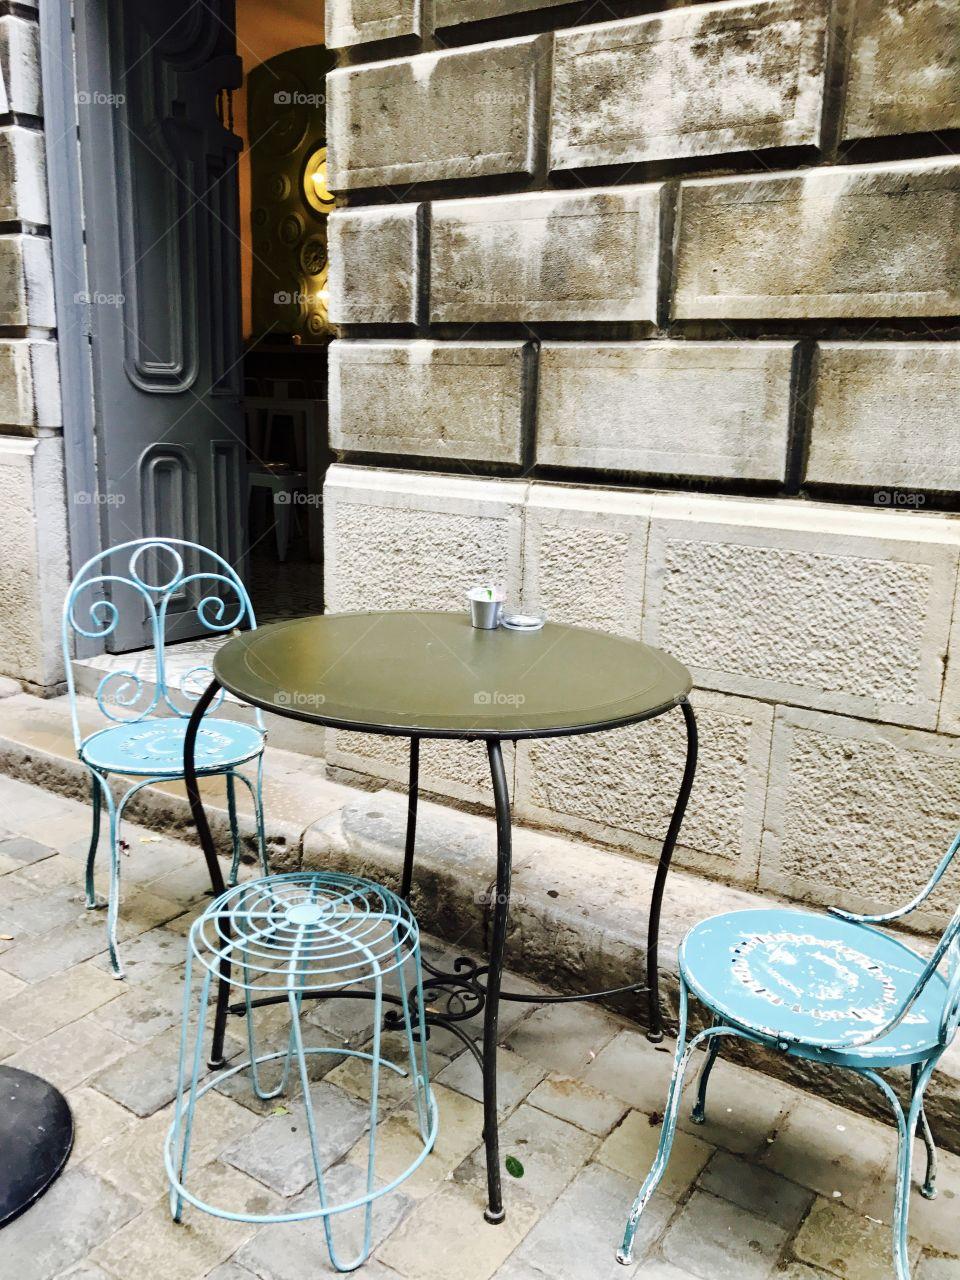 #outdoors #table #chairs #tea #coffee